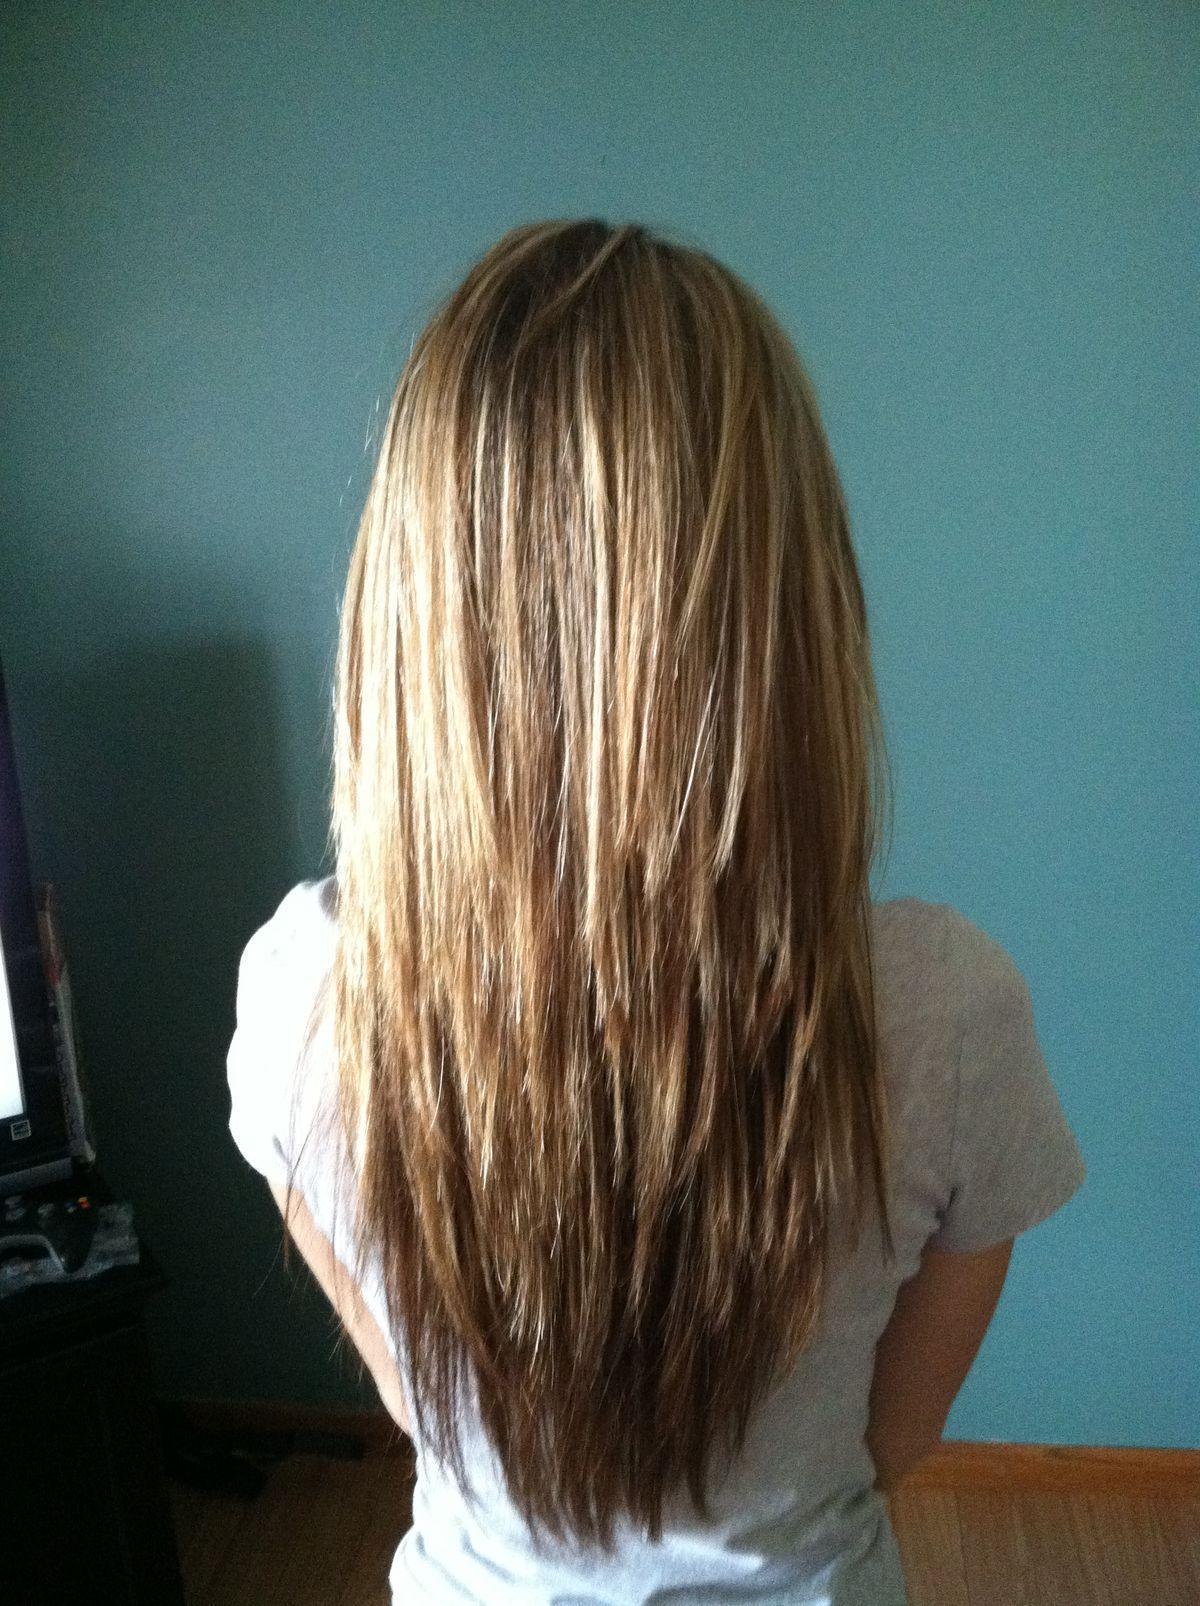 Fafffabg pixels hair do